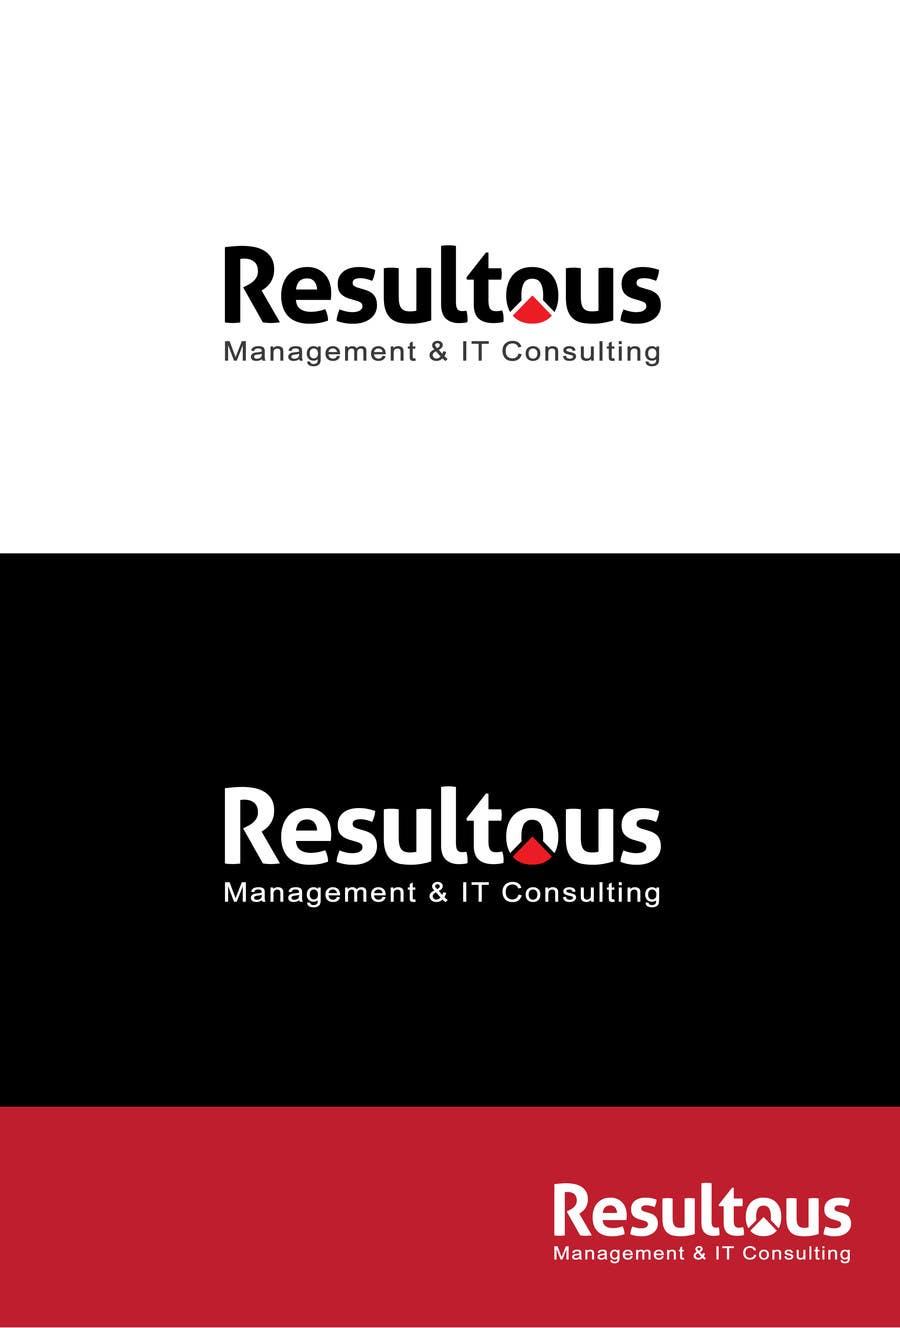 Proposition n°63 du concours Design a Logo for Resultous Management & IT Consulting